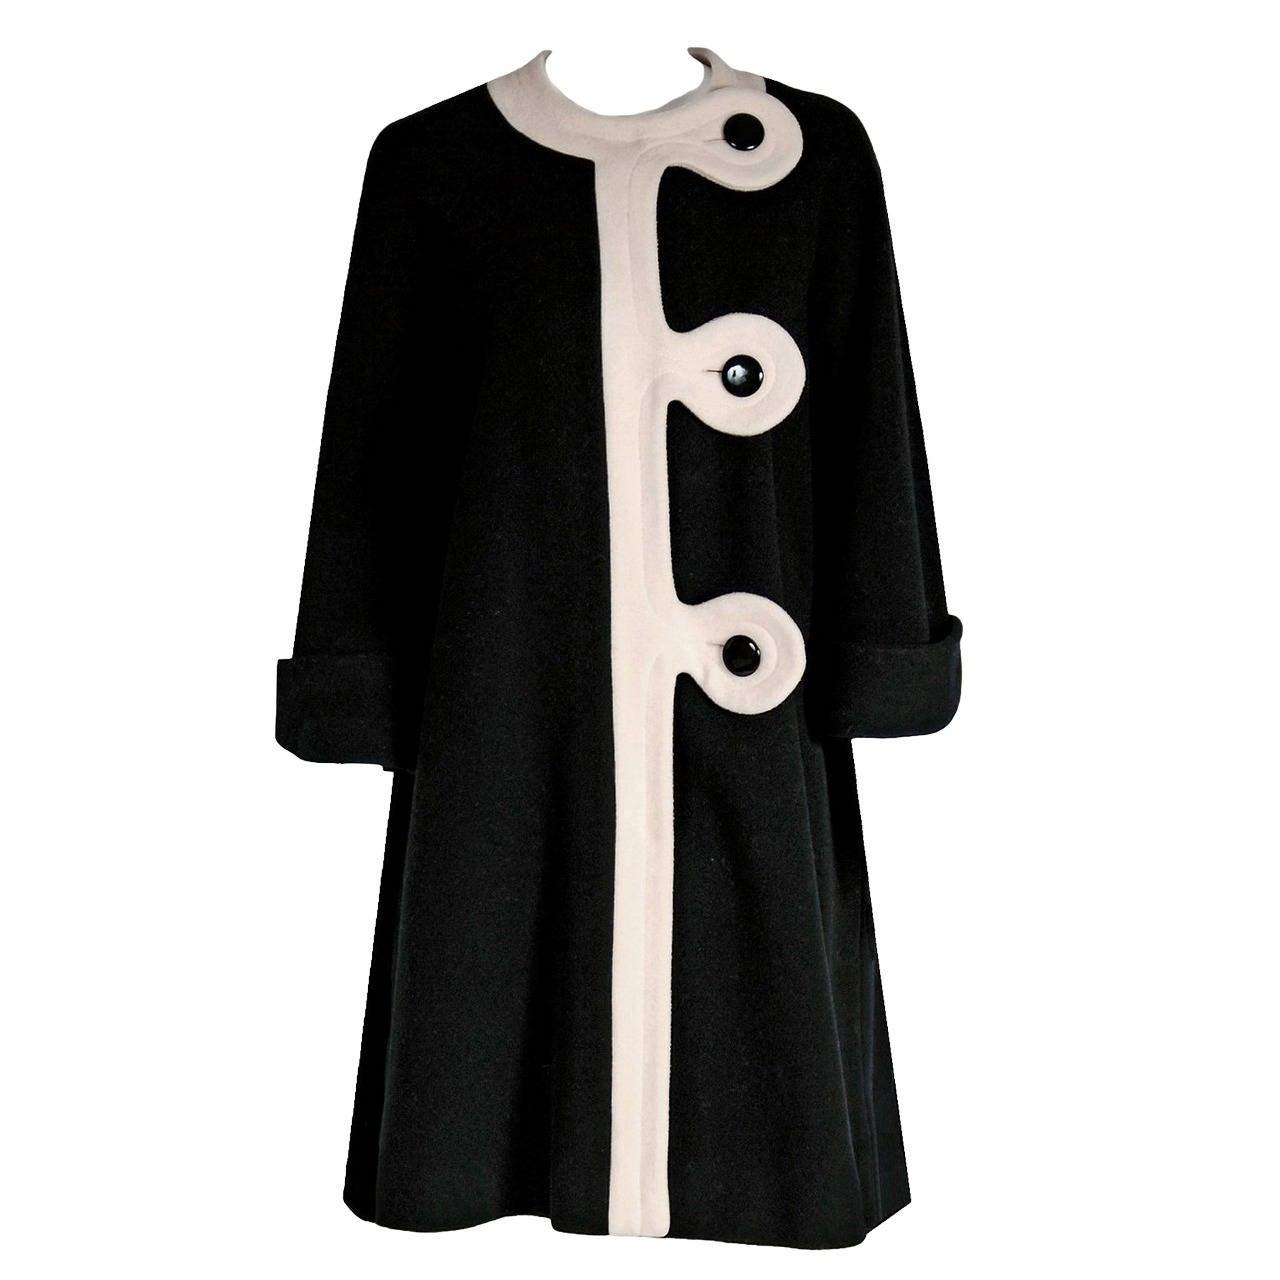 1960's Pierre Cardin Black & Ivory Block-Color Wool Mod Space-Age Swing Coat For Sale